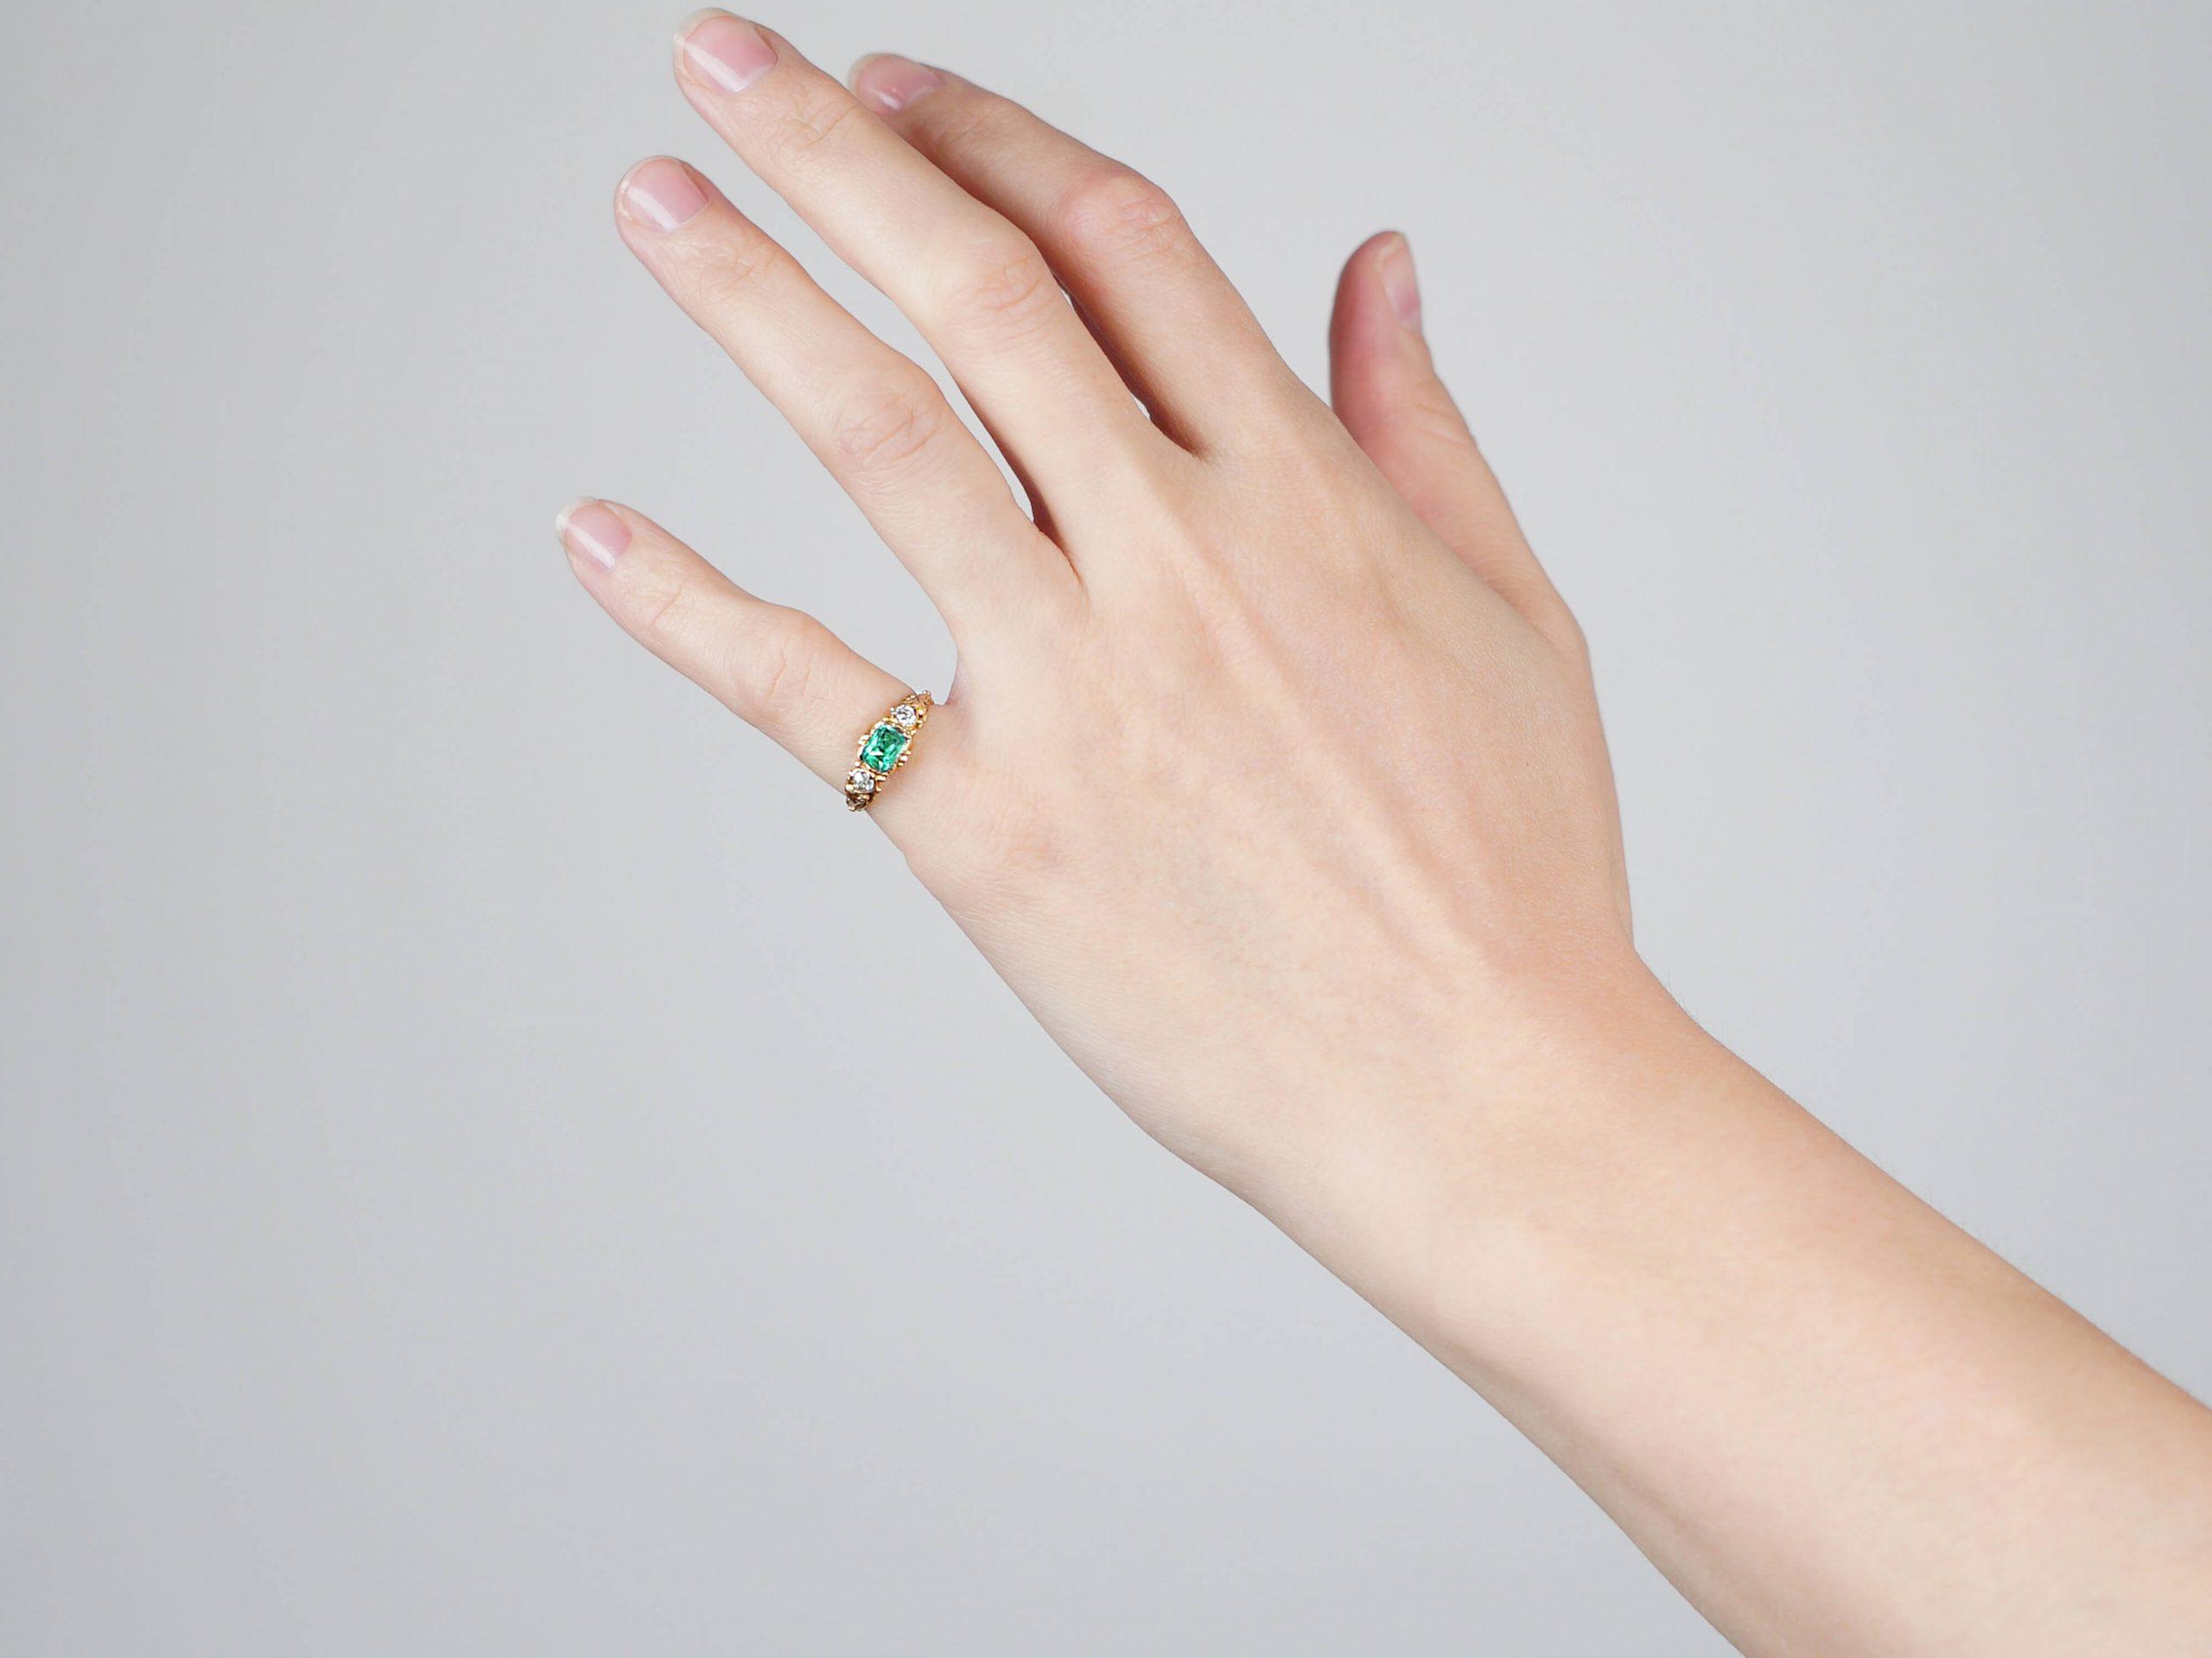 Regency 15ct Gold, Emerald & Diamond Ring